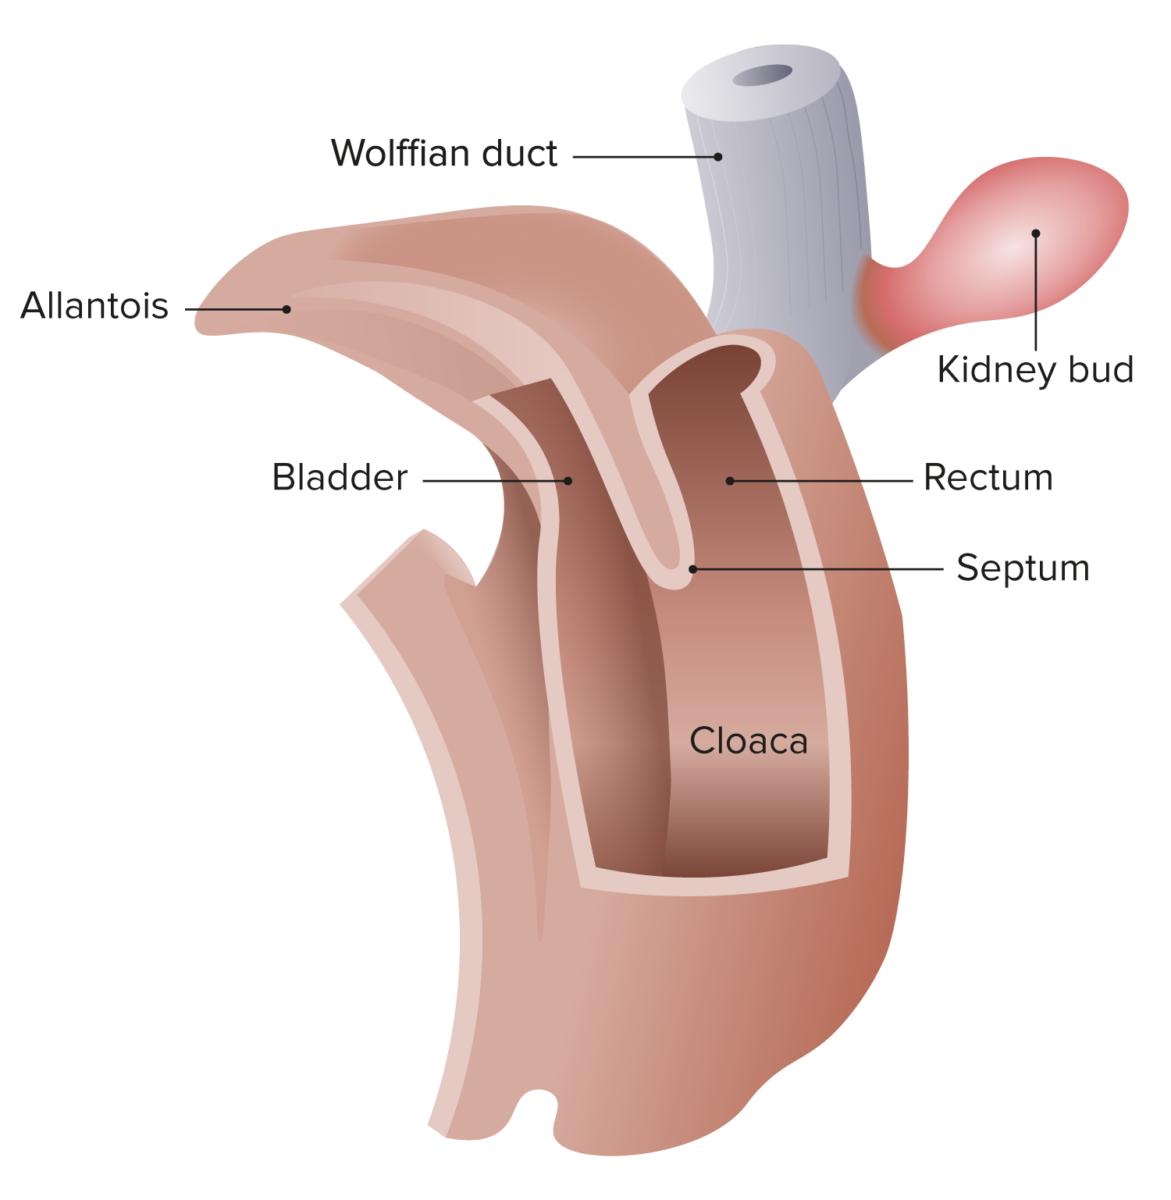 Cloaca of human embryo